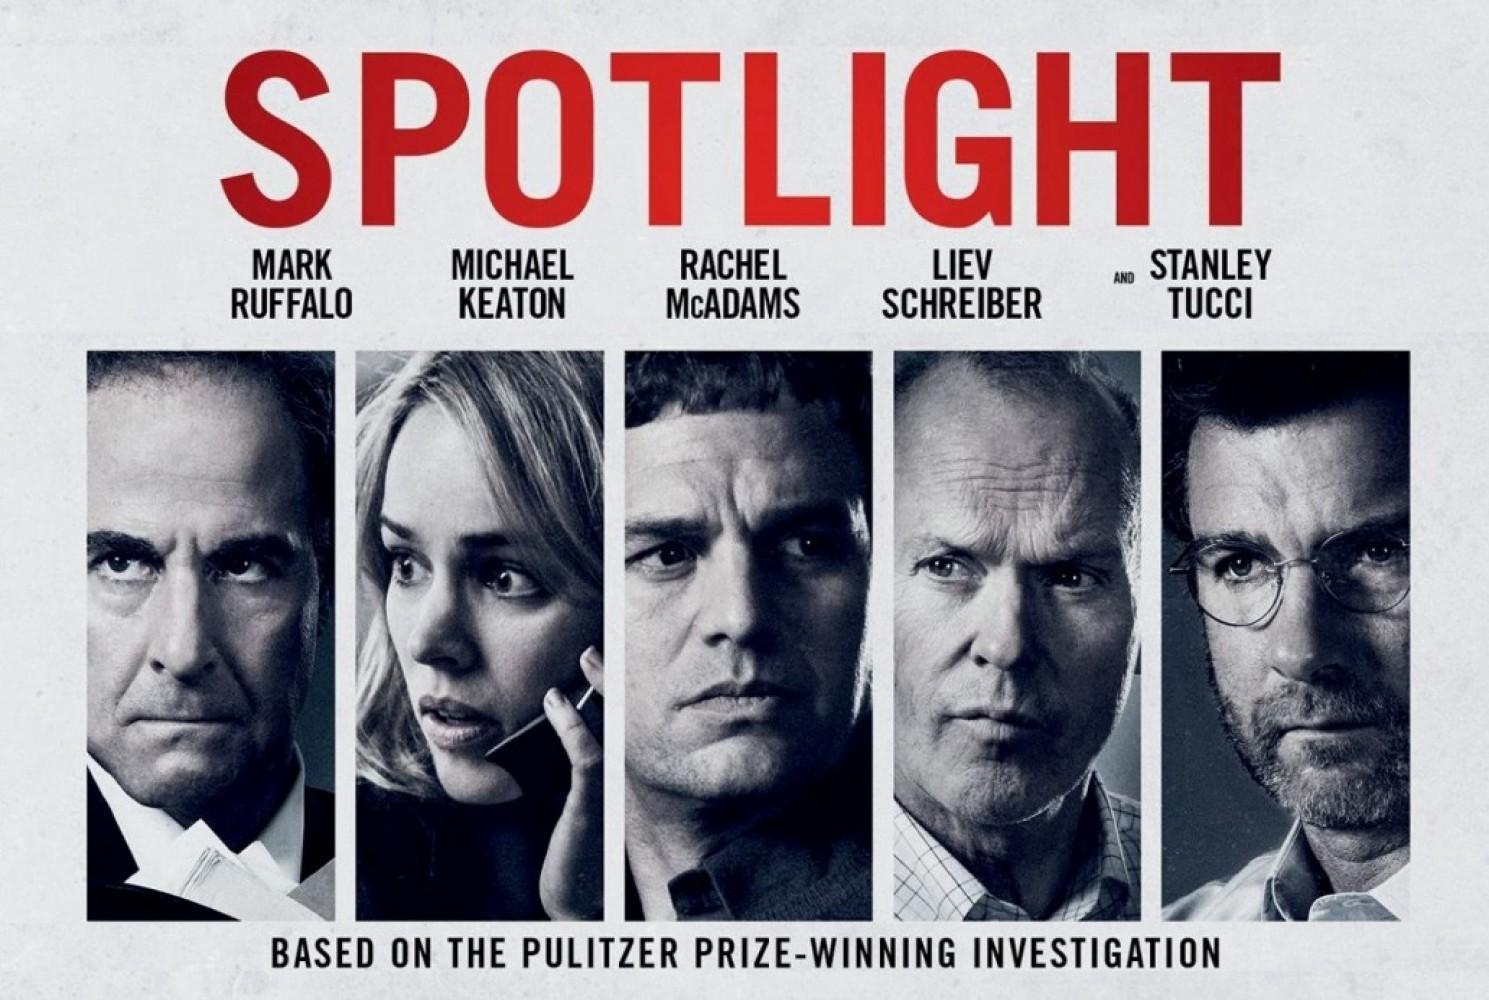 Spotlight rewatch this weekend